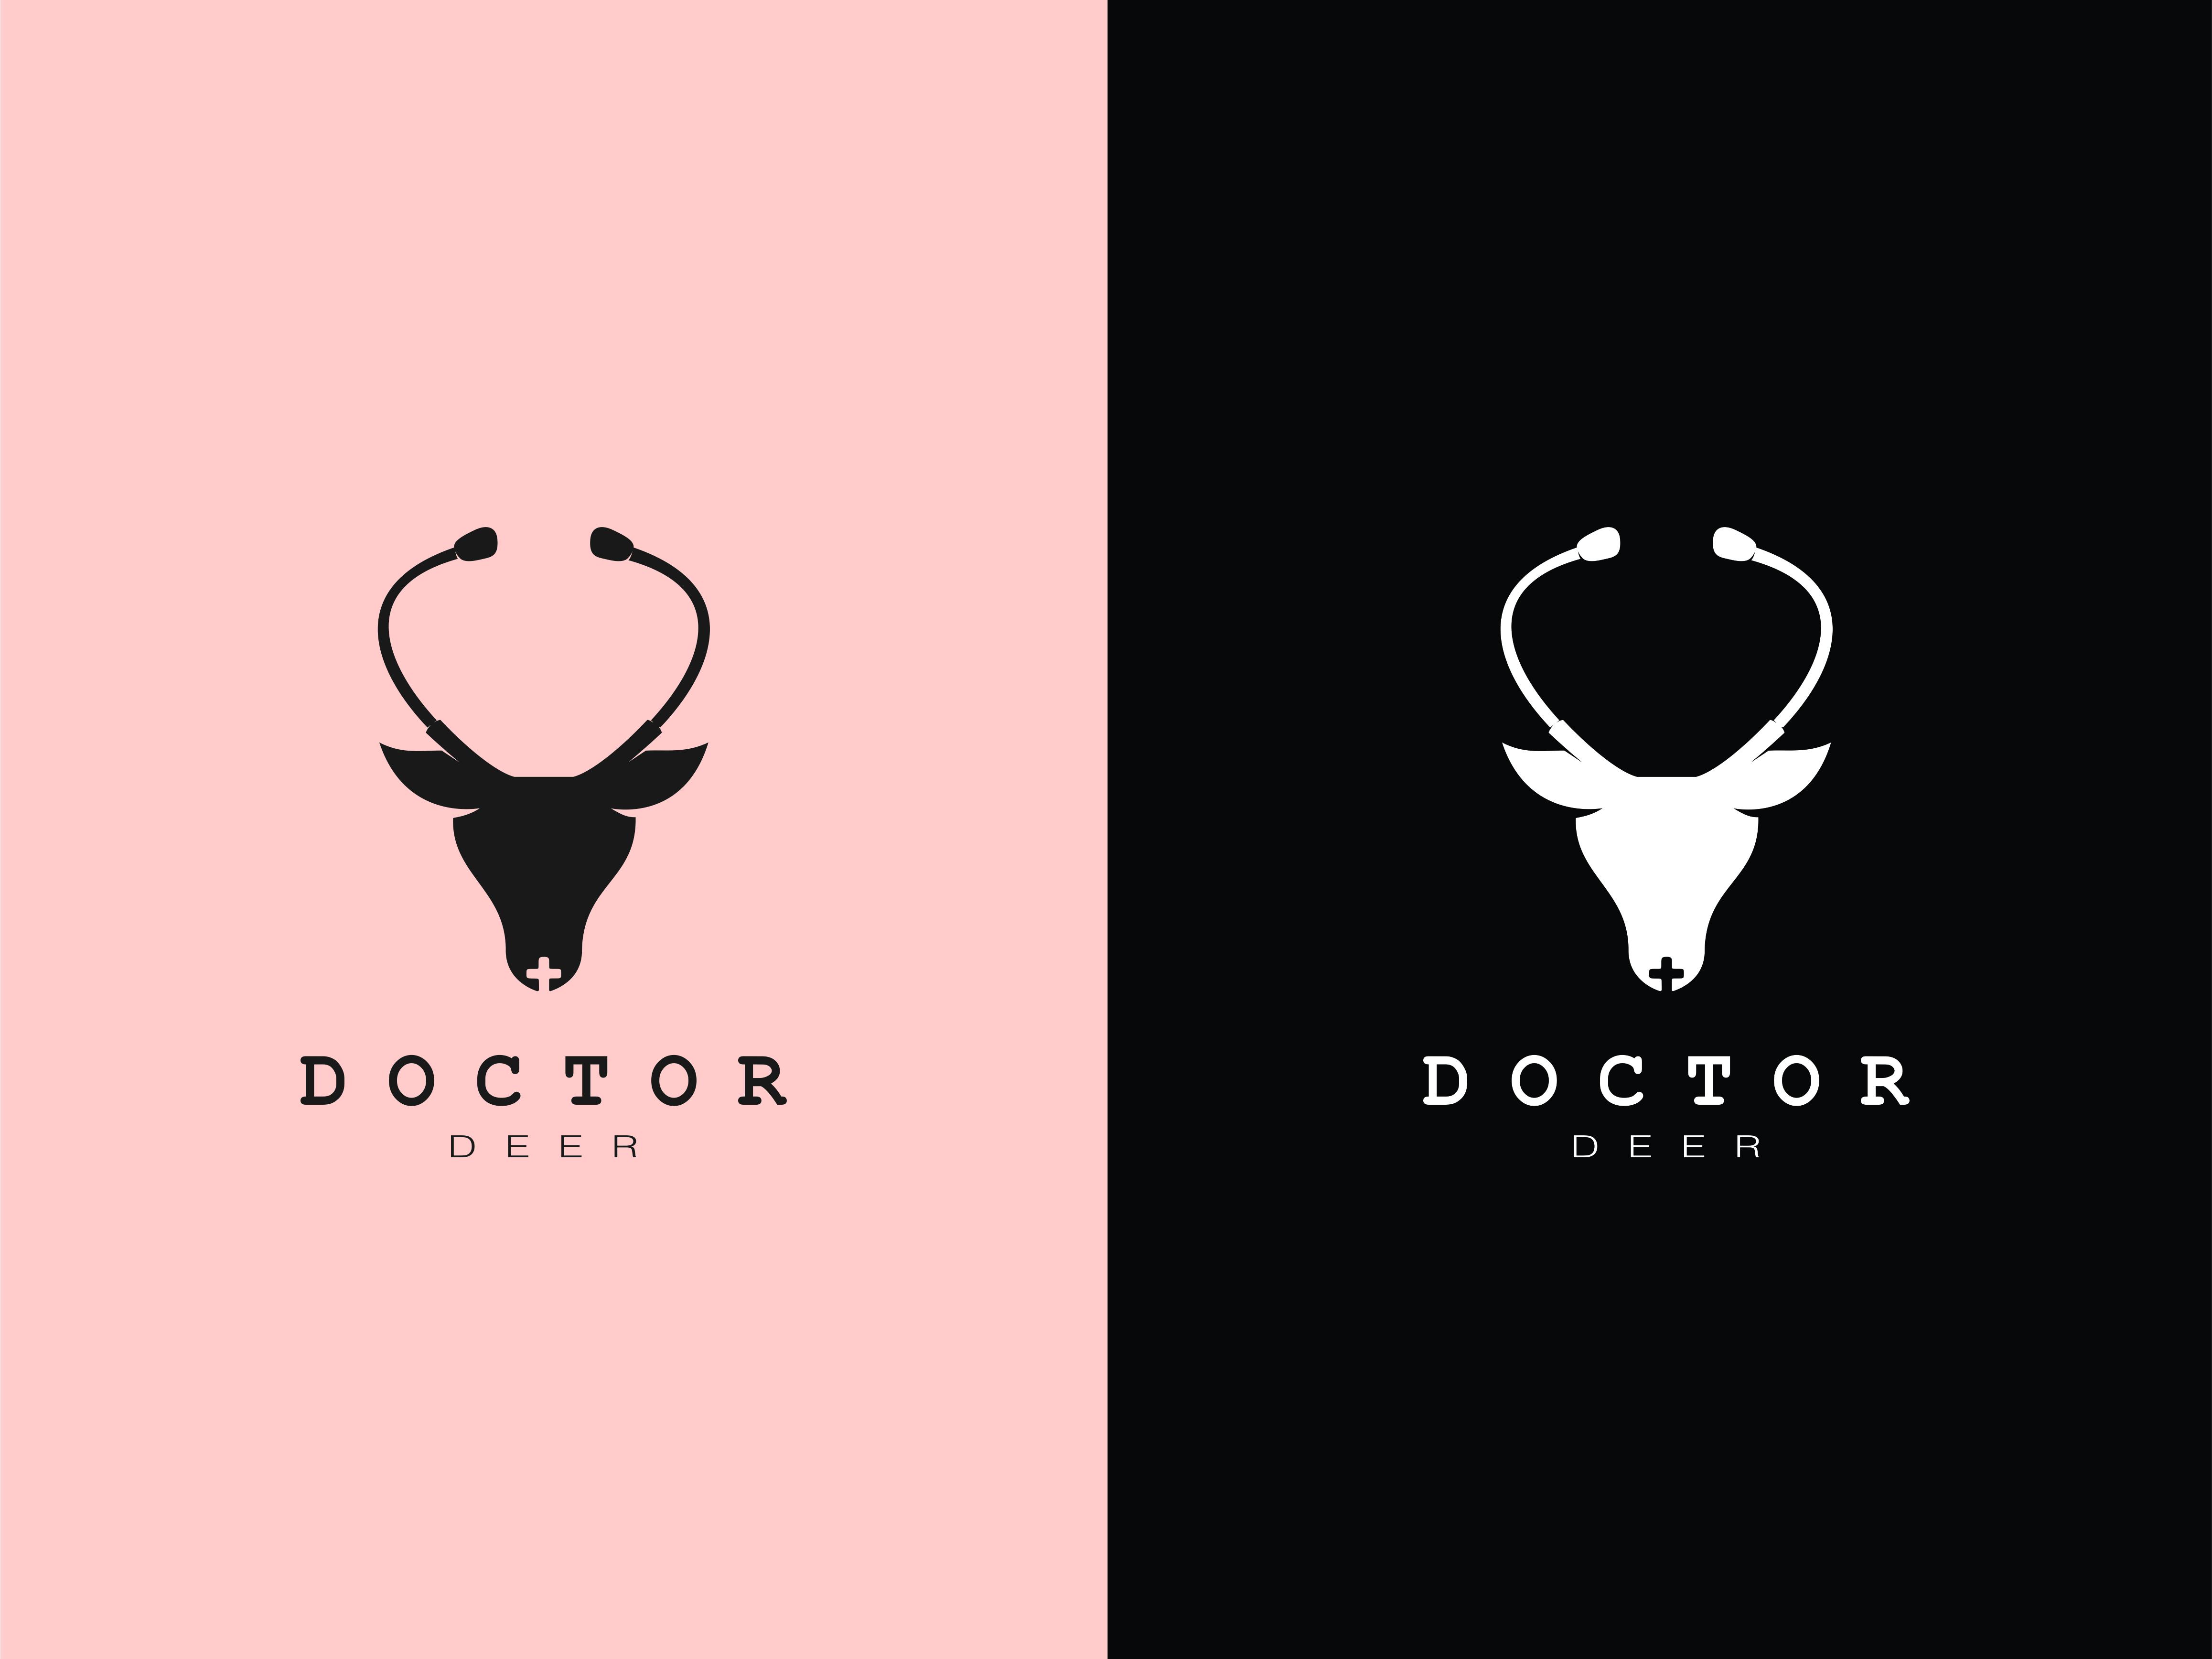 Backup of doctor deer1